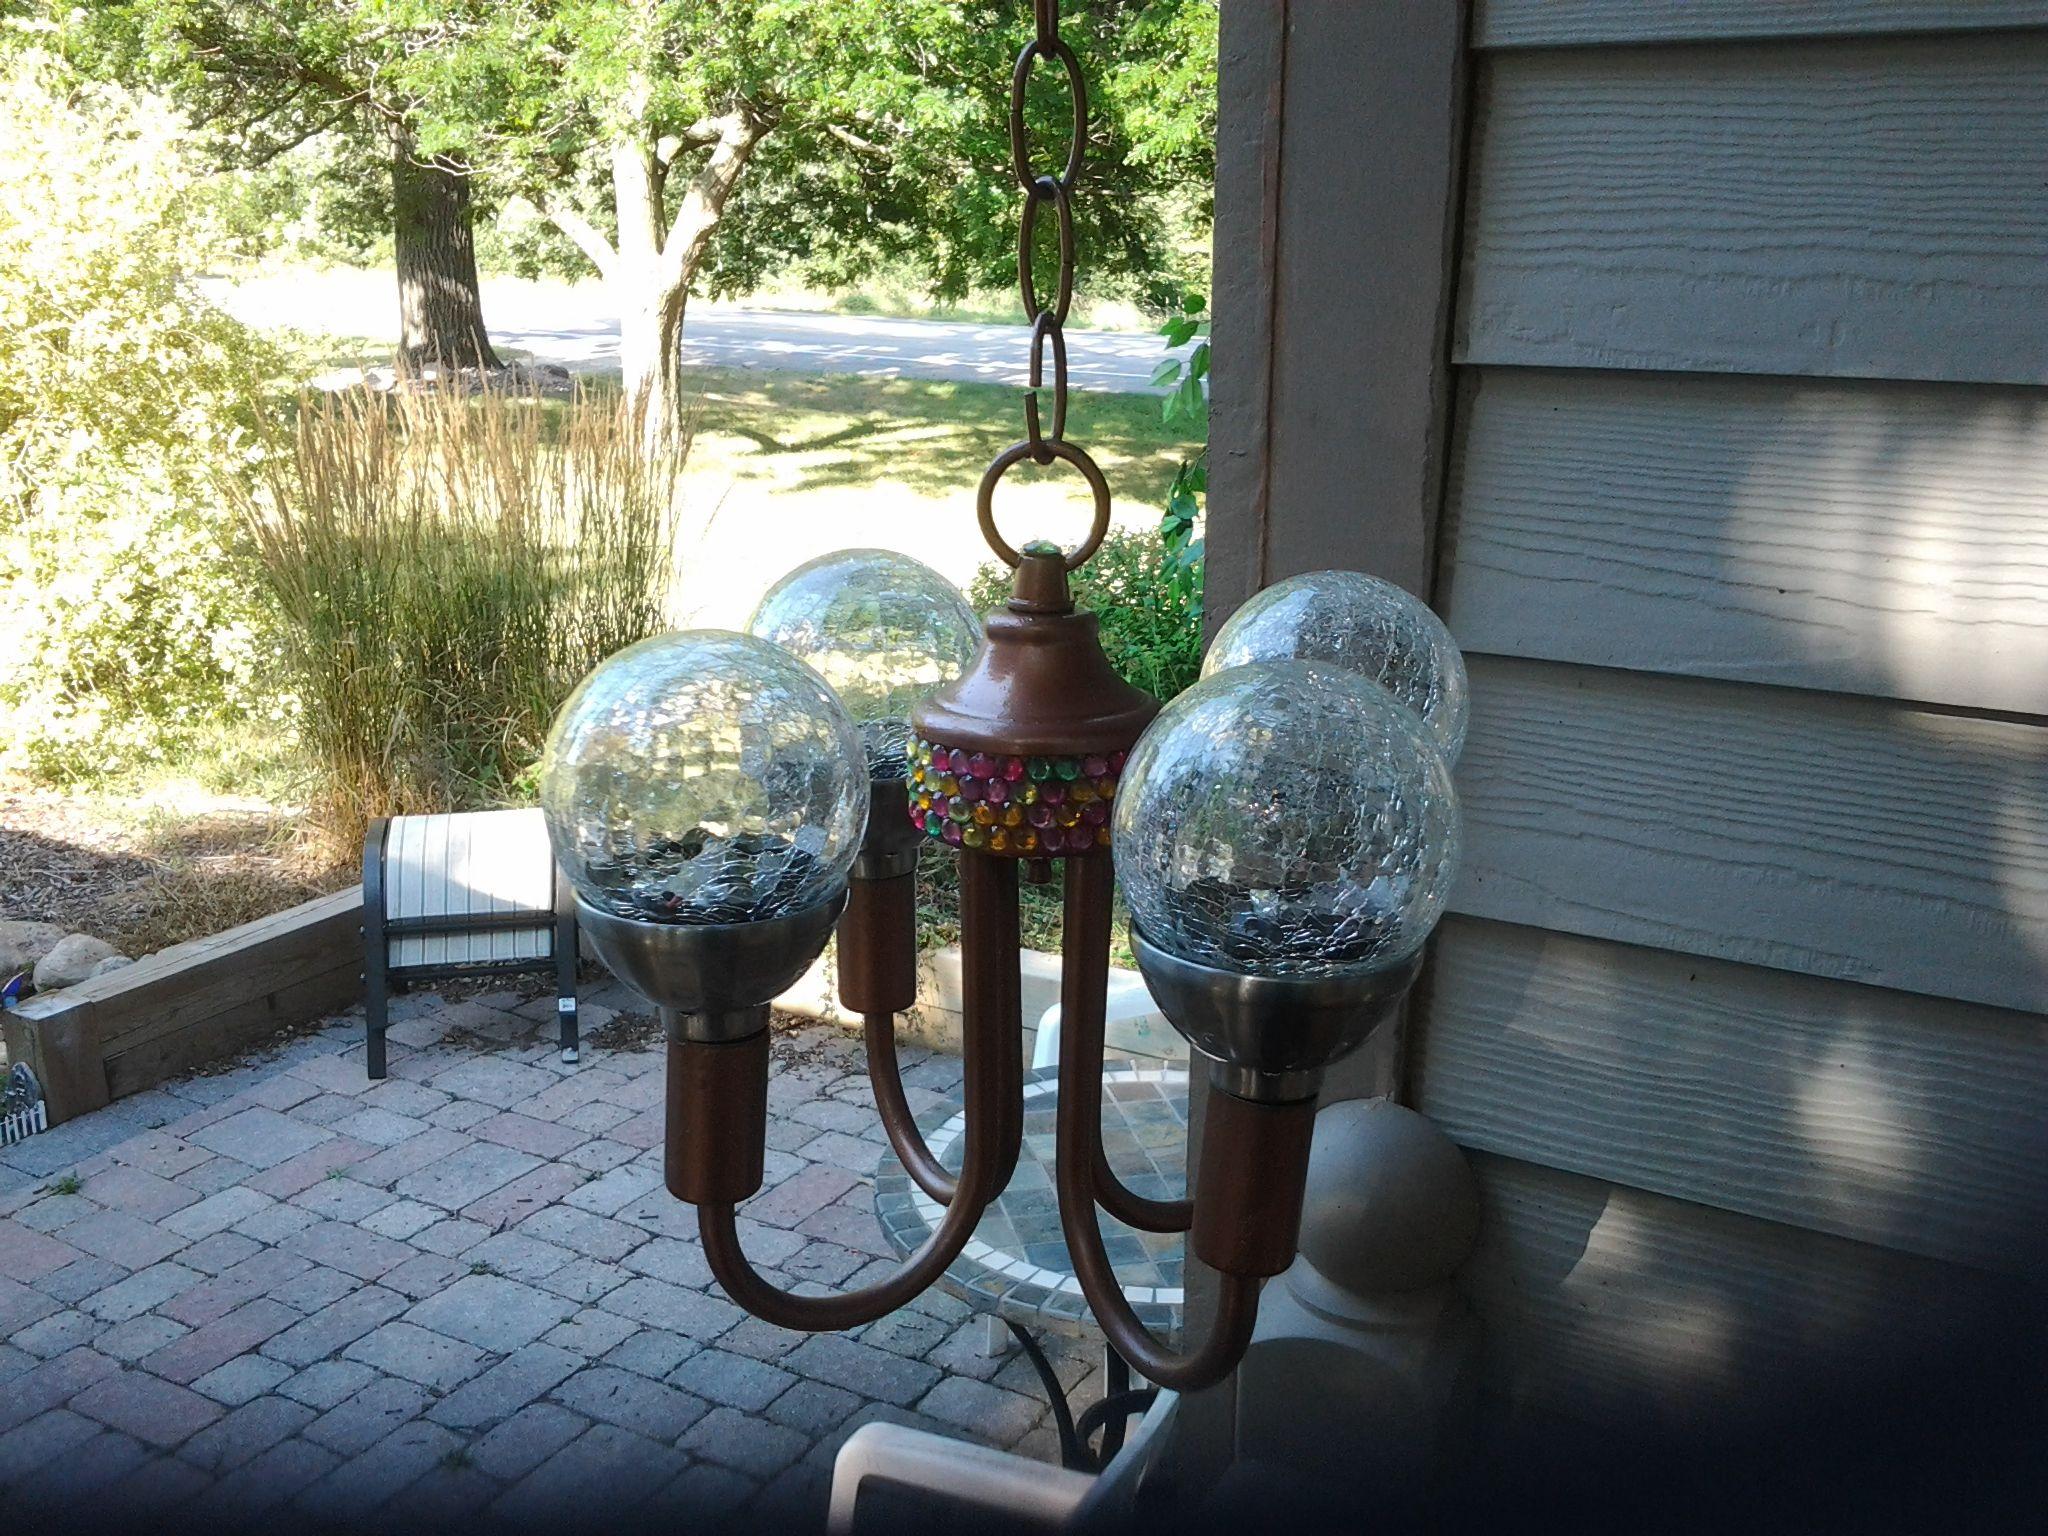 Solar chandelier my garden planning pinterest for Solar light chandelier diy